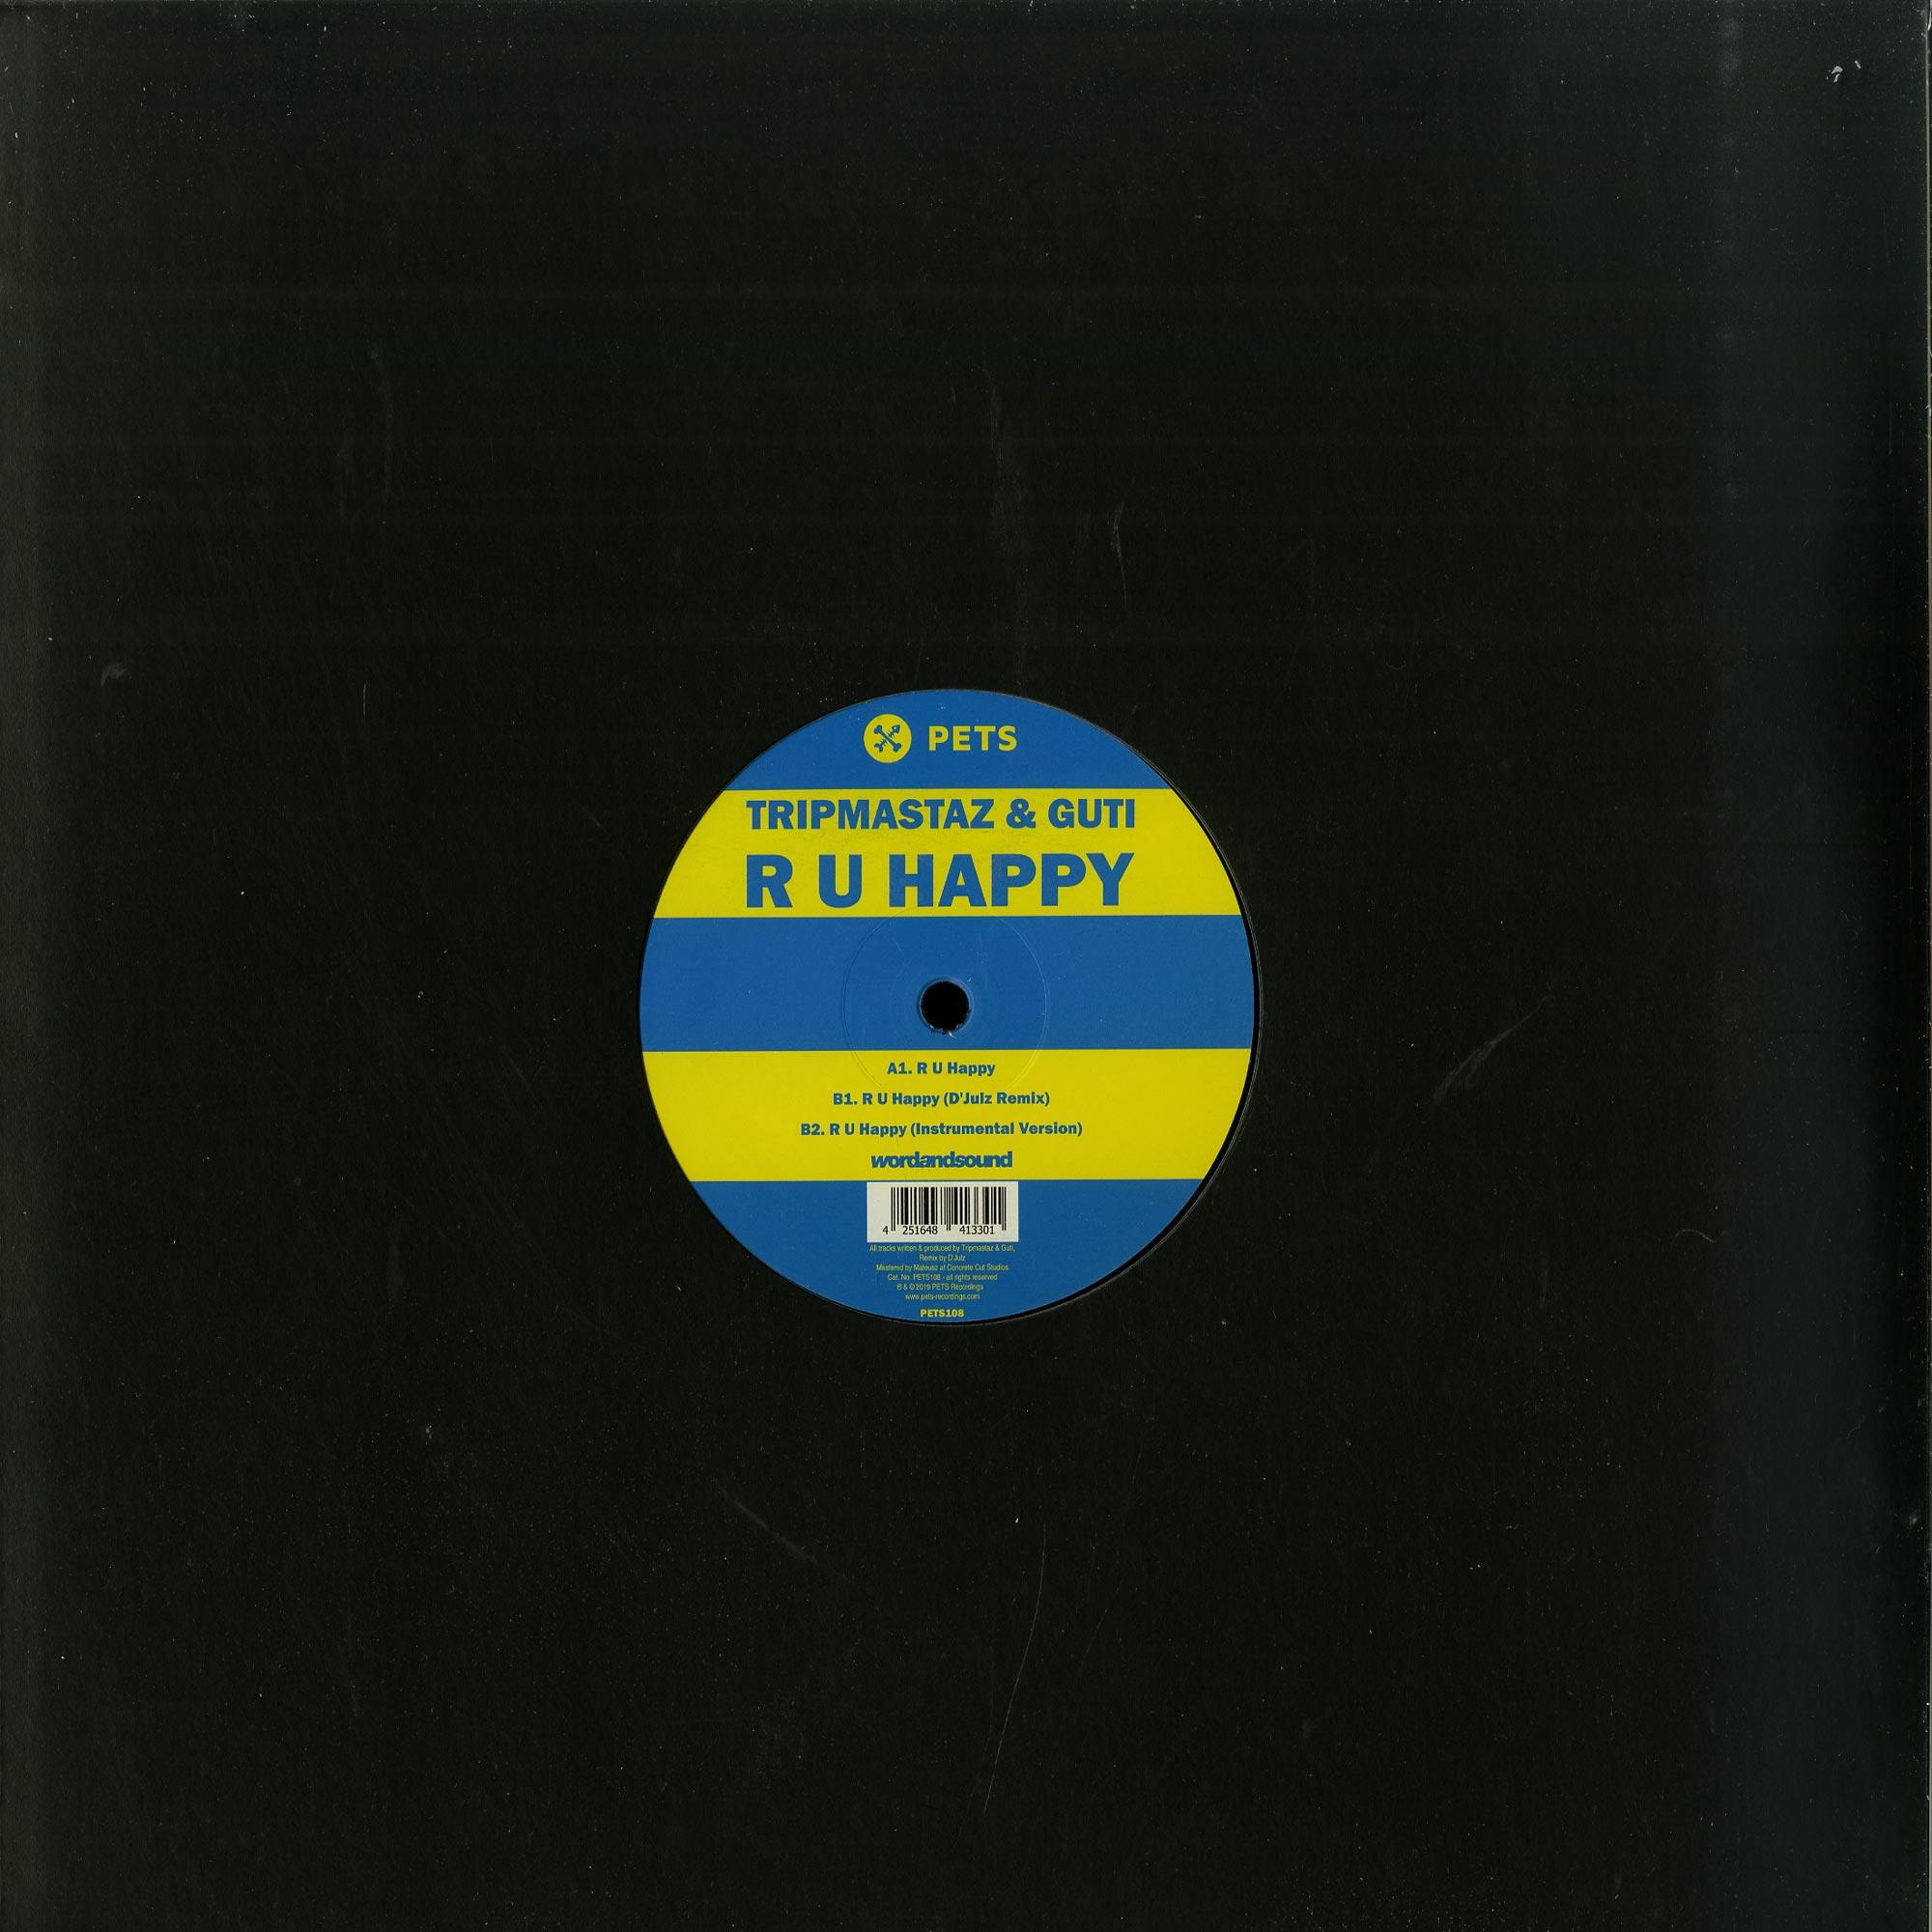 Tripmastaz & Guti - RU HAPPY